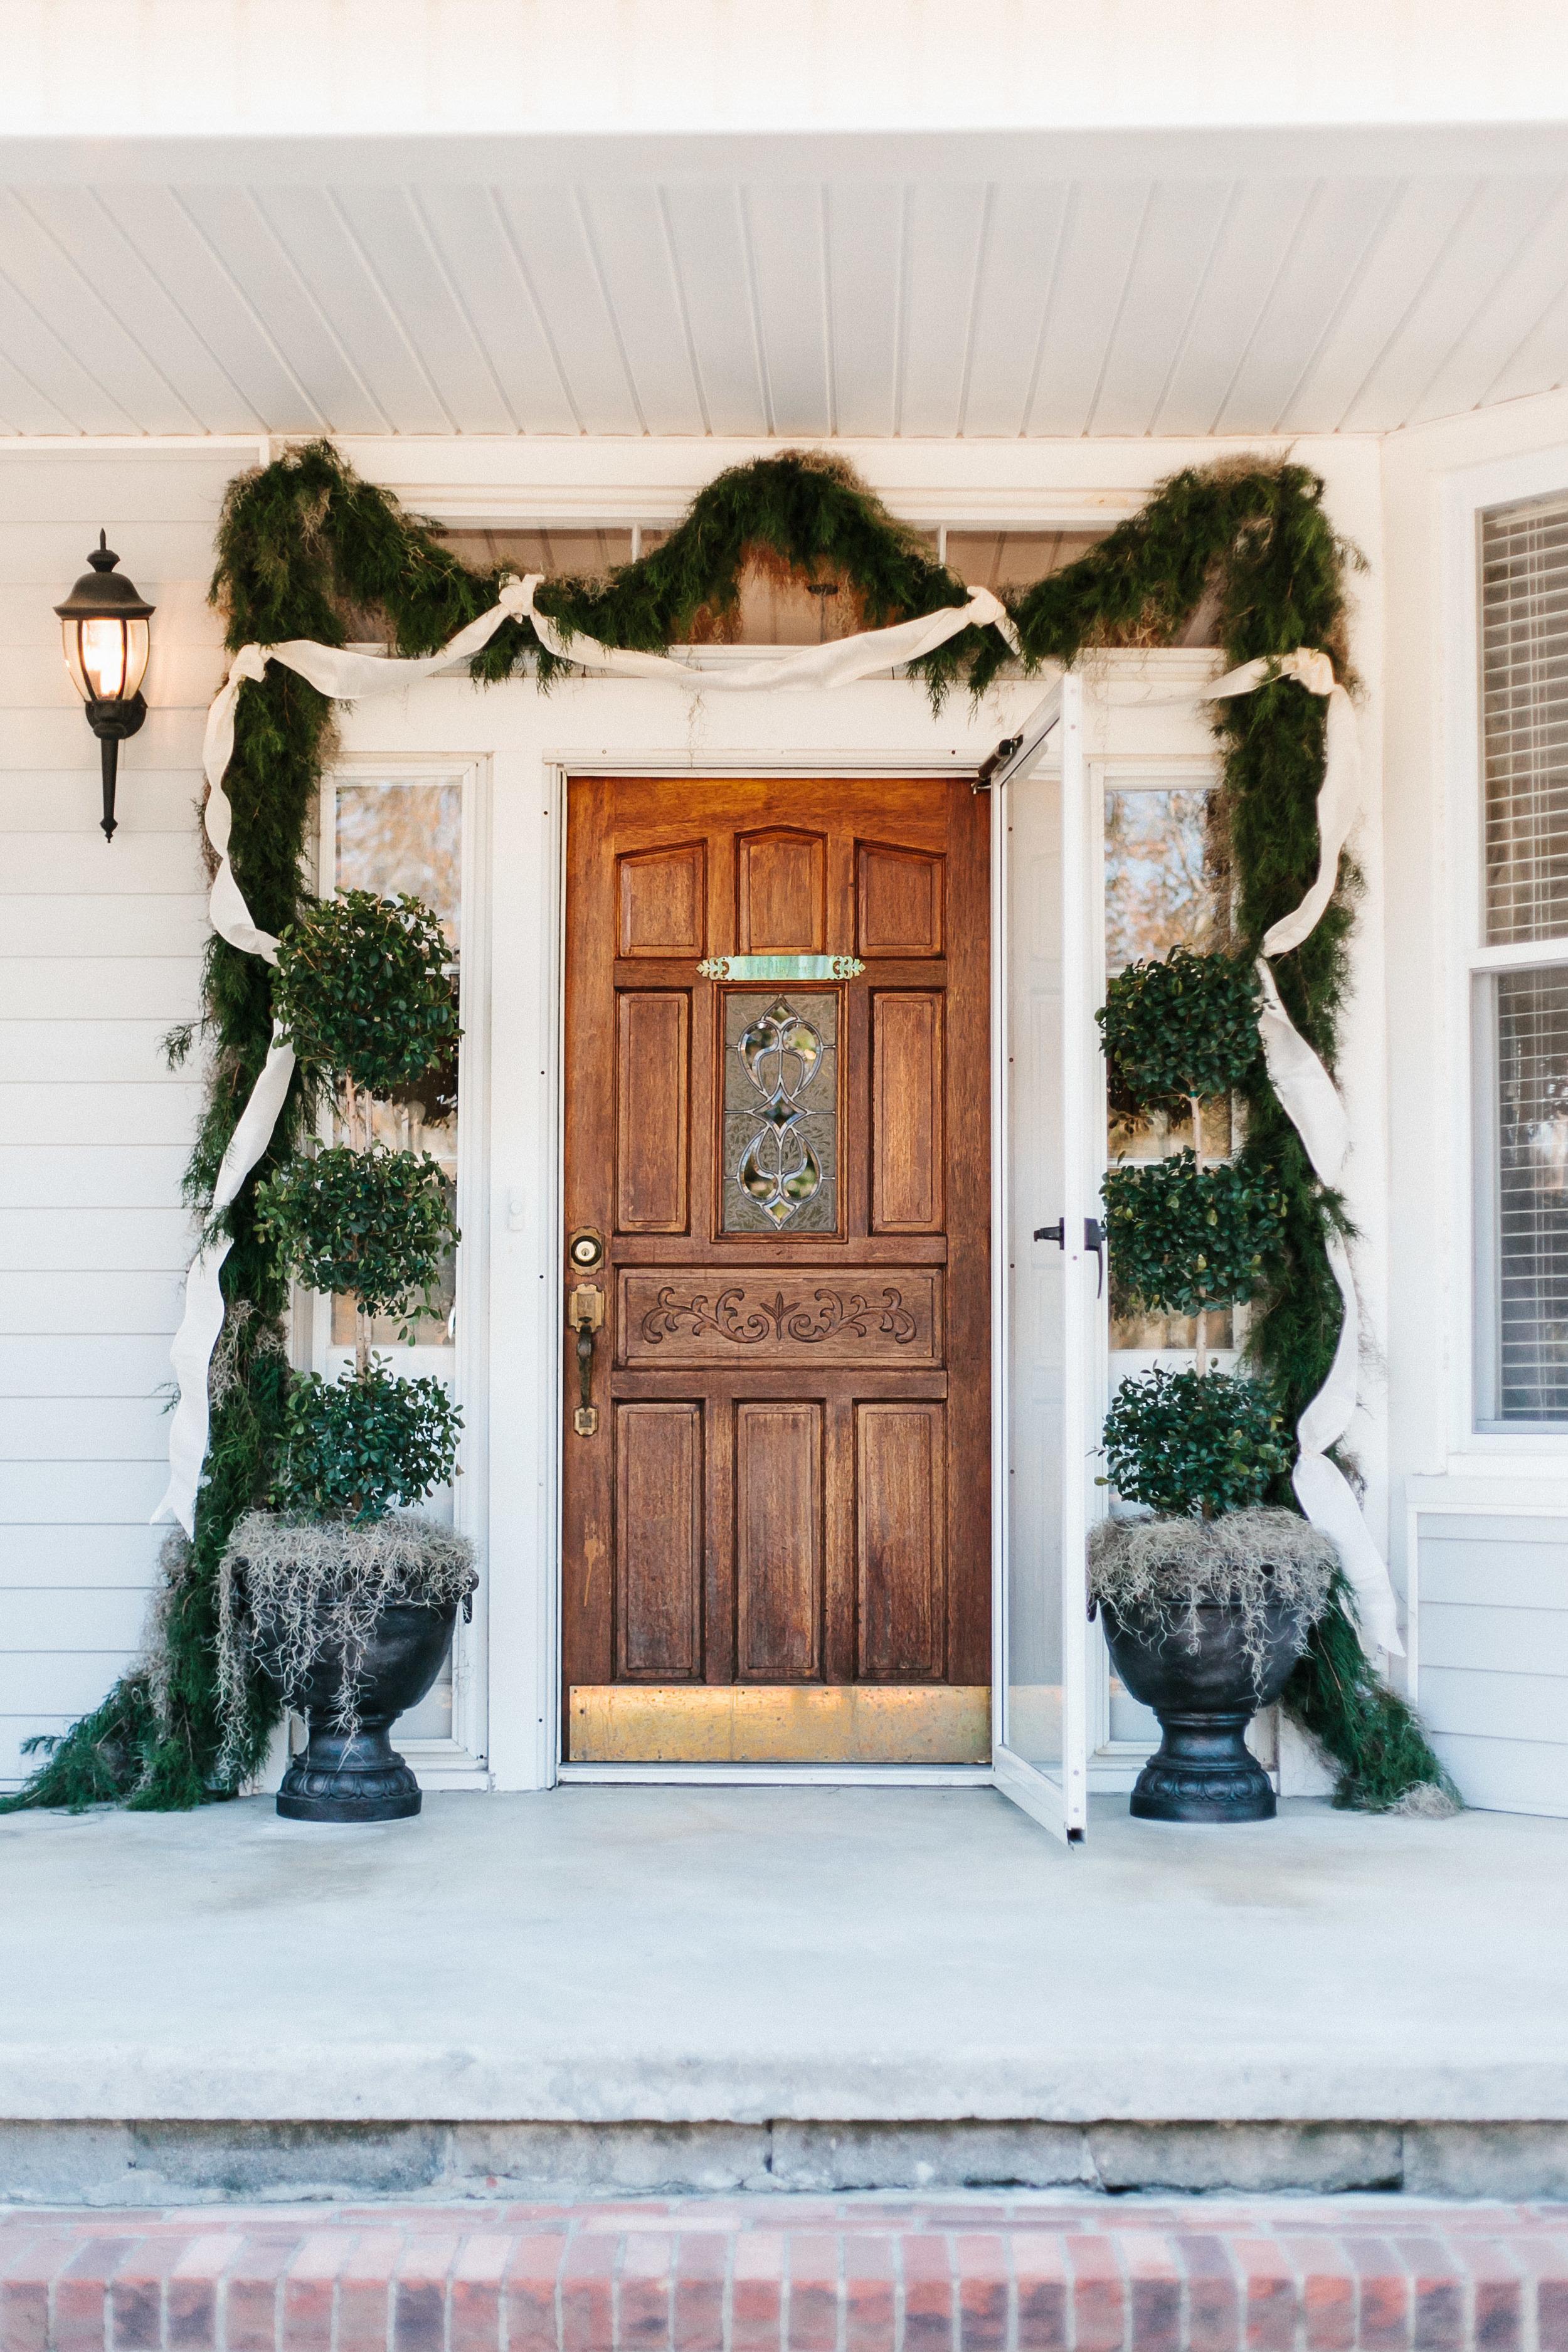 Winter wedding greenery in Stillmore, GA by Mark Williams Studio